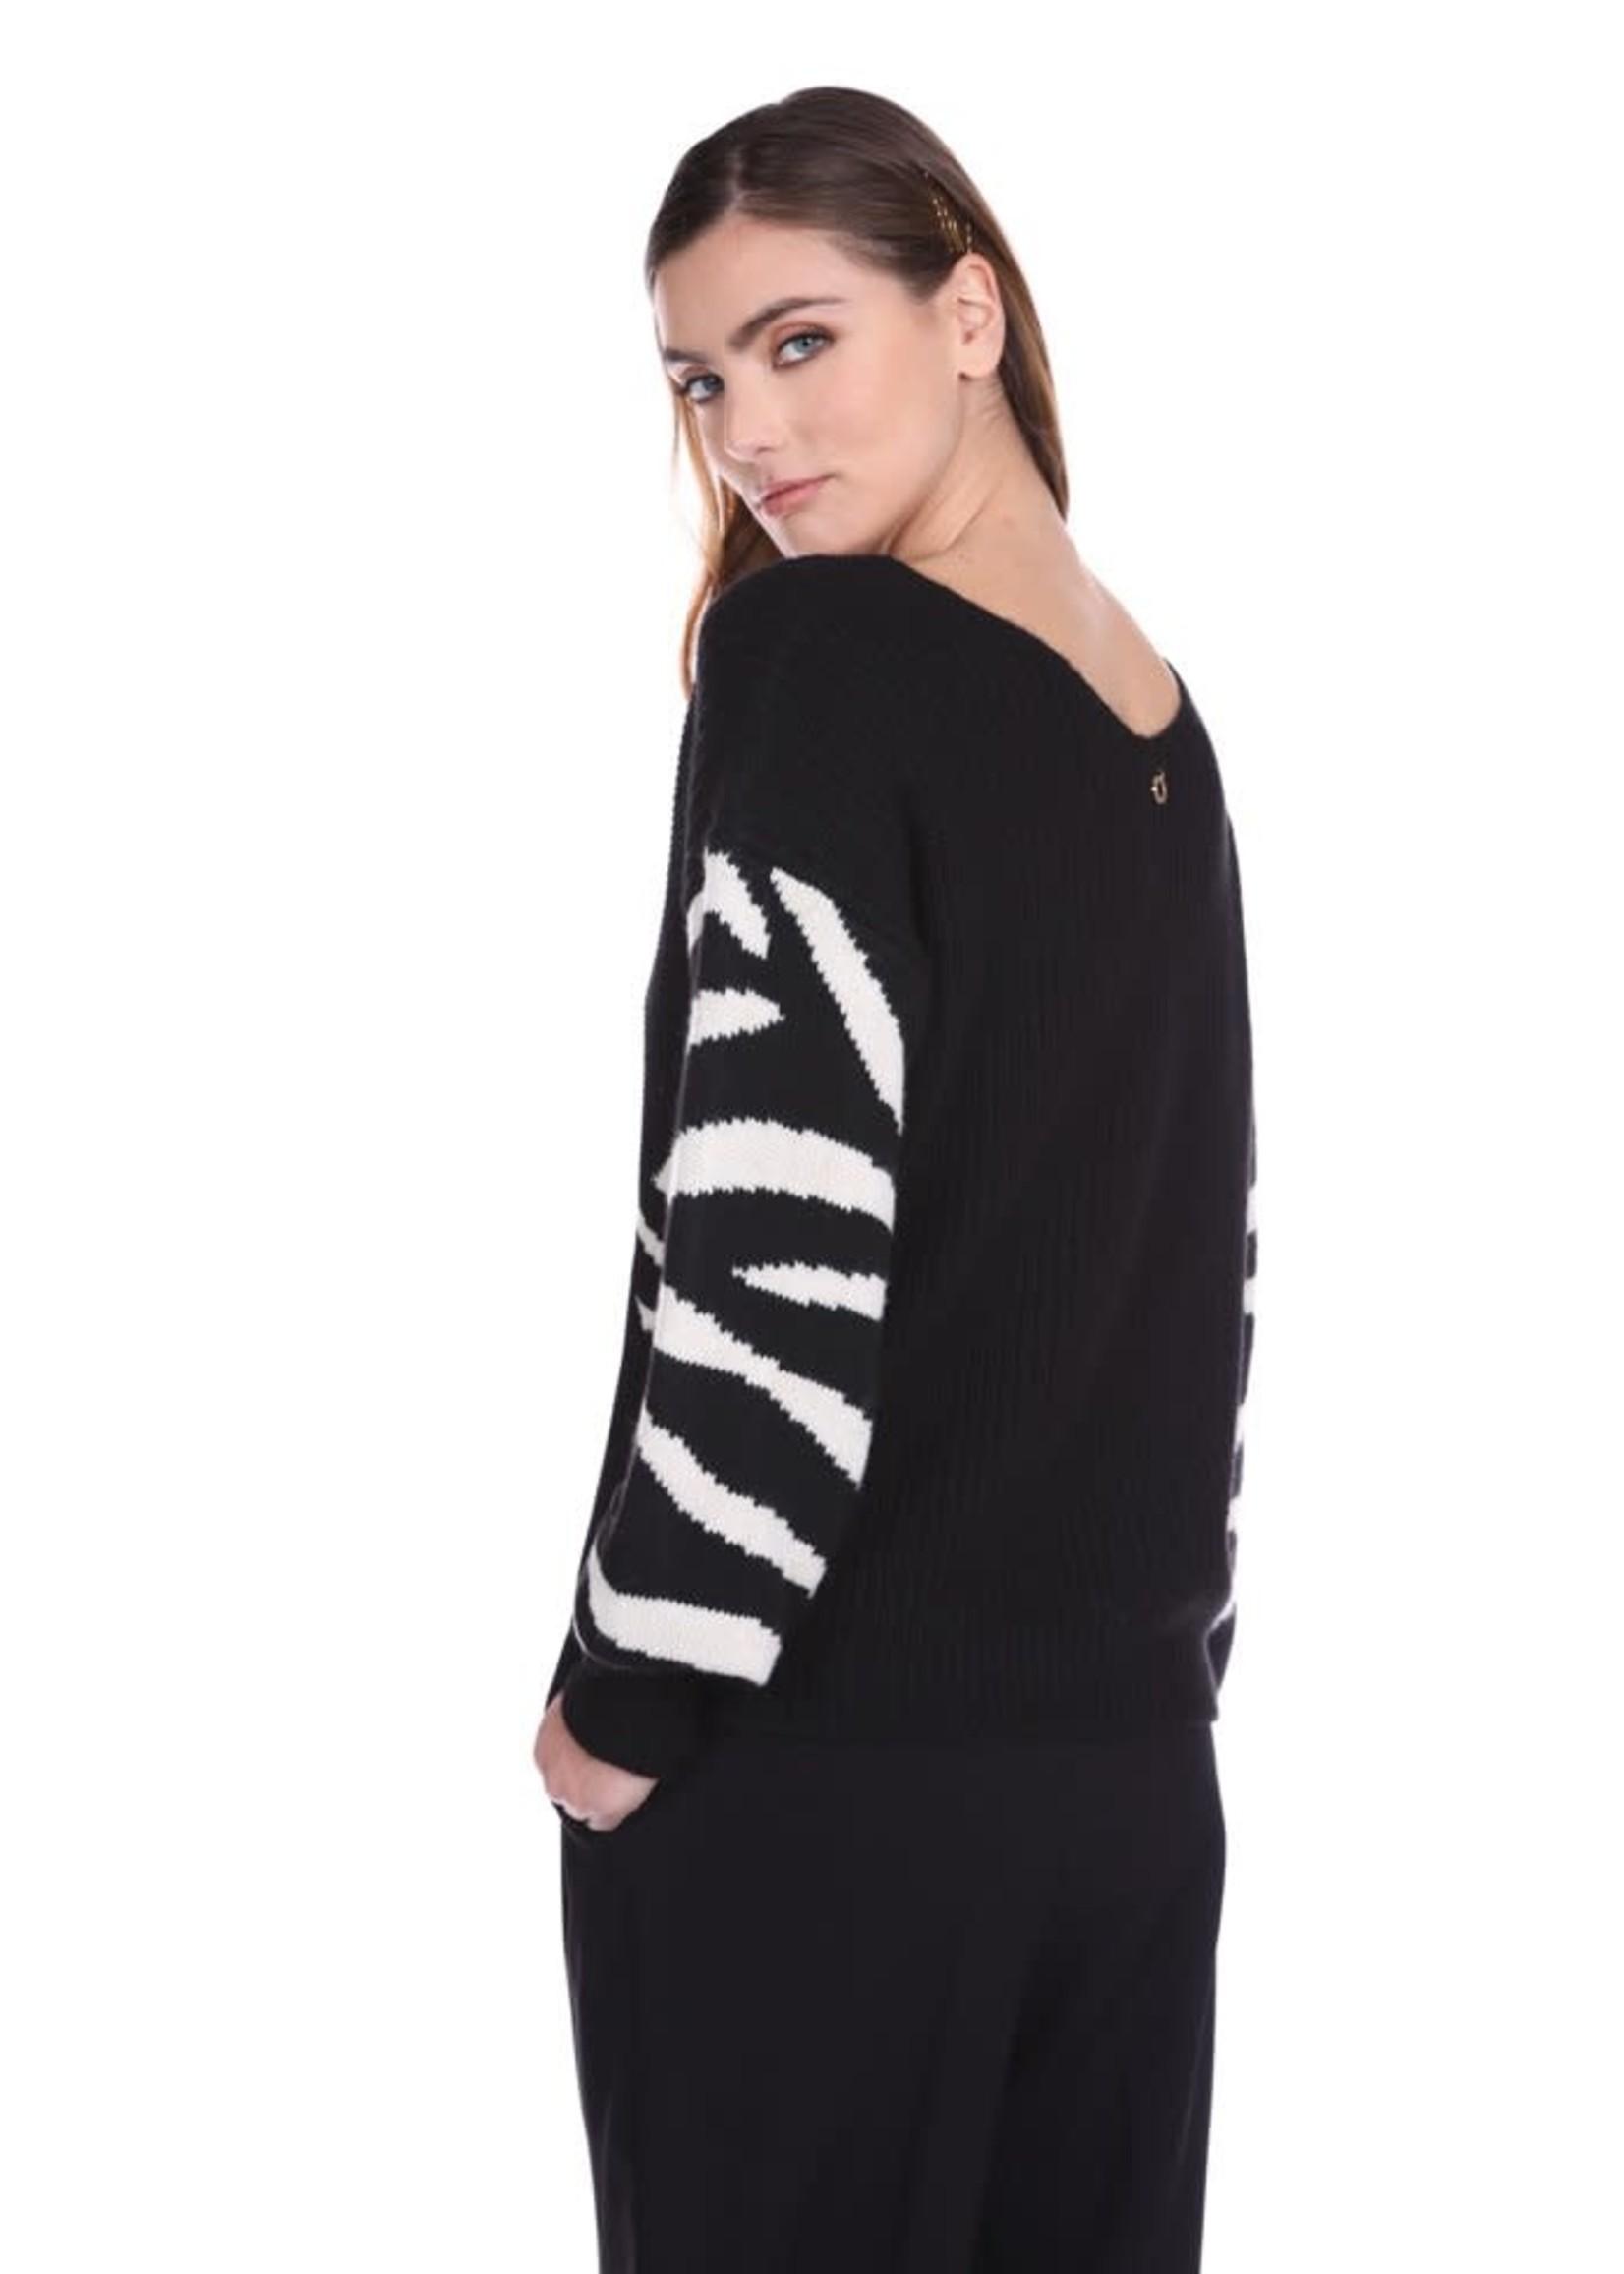 Relish SATIWA trui met lange mouwen, dubbele v-hals wijde jacquard met dierenprint en ruit